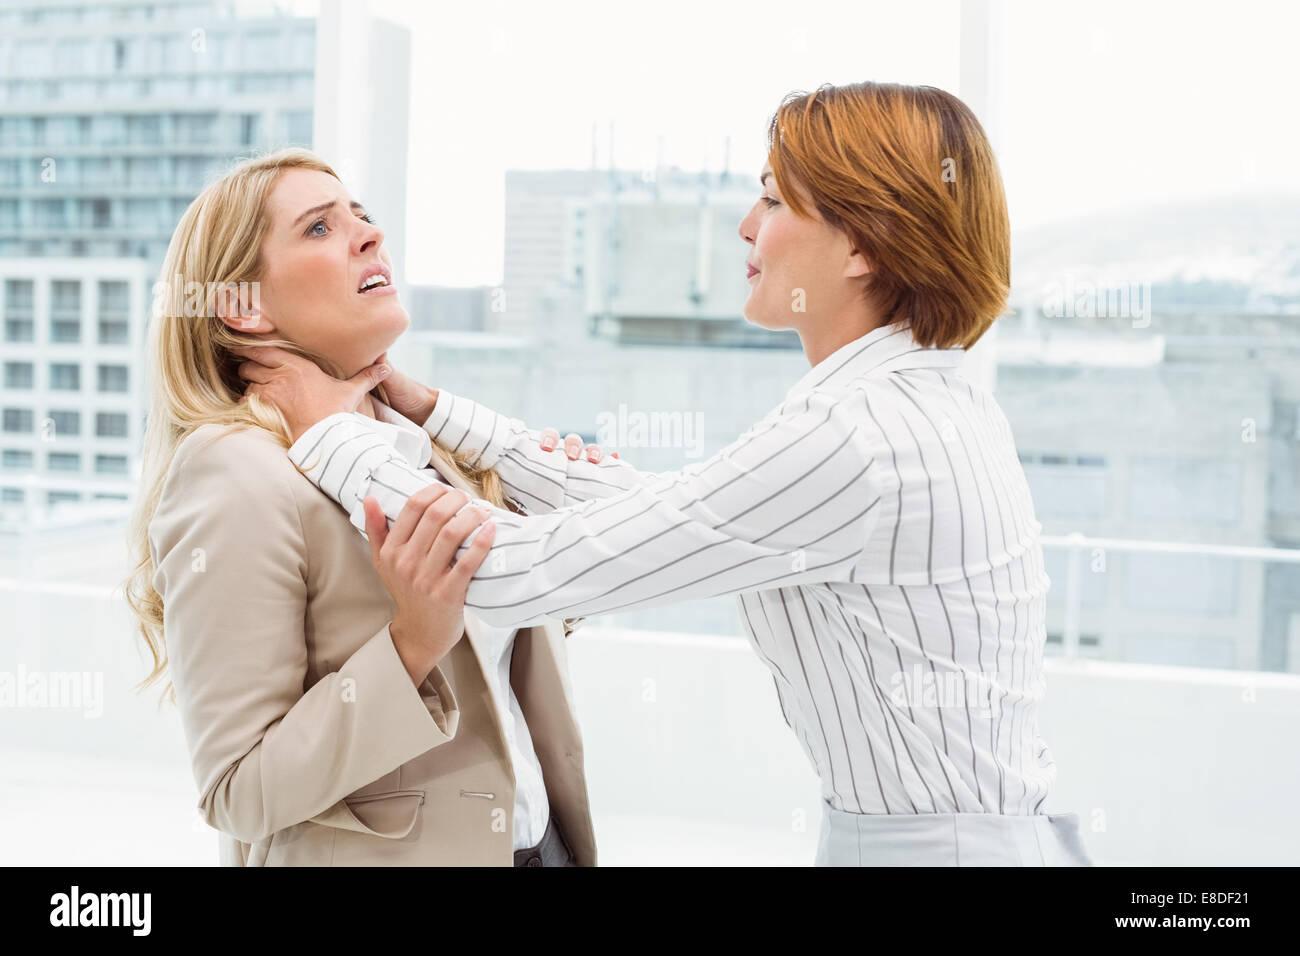 Businesswomen having une violente lutte in office Photo Stock